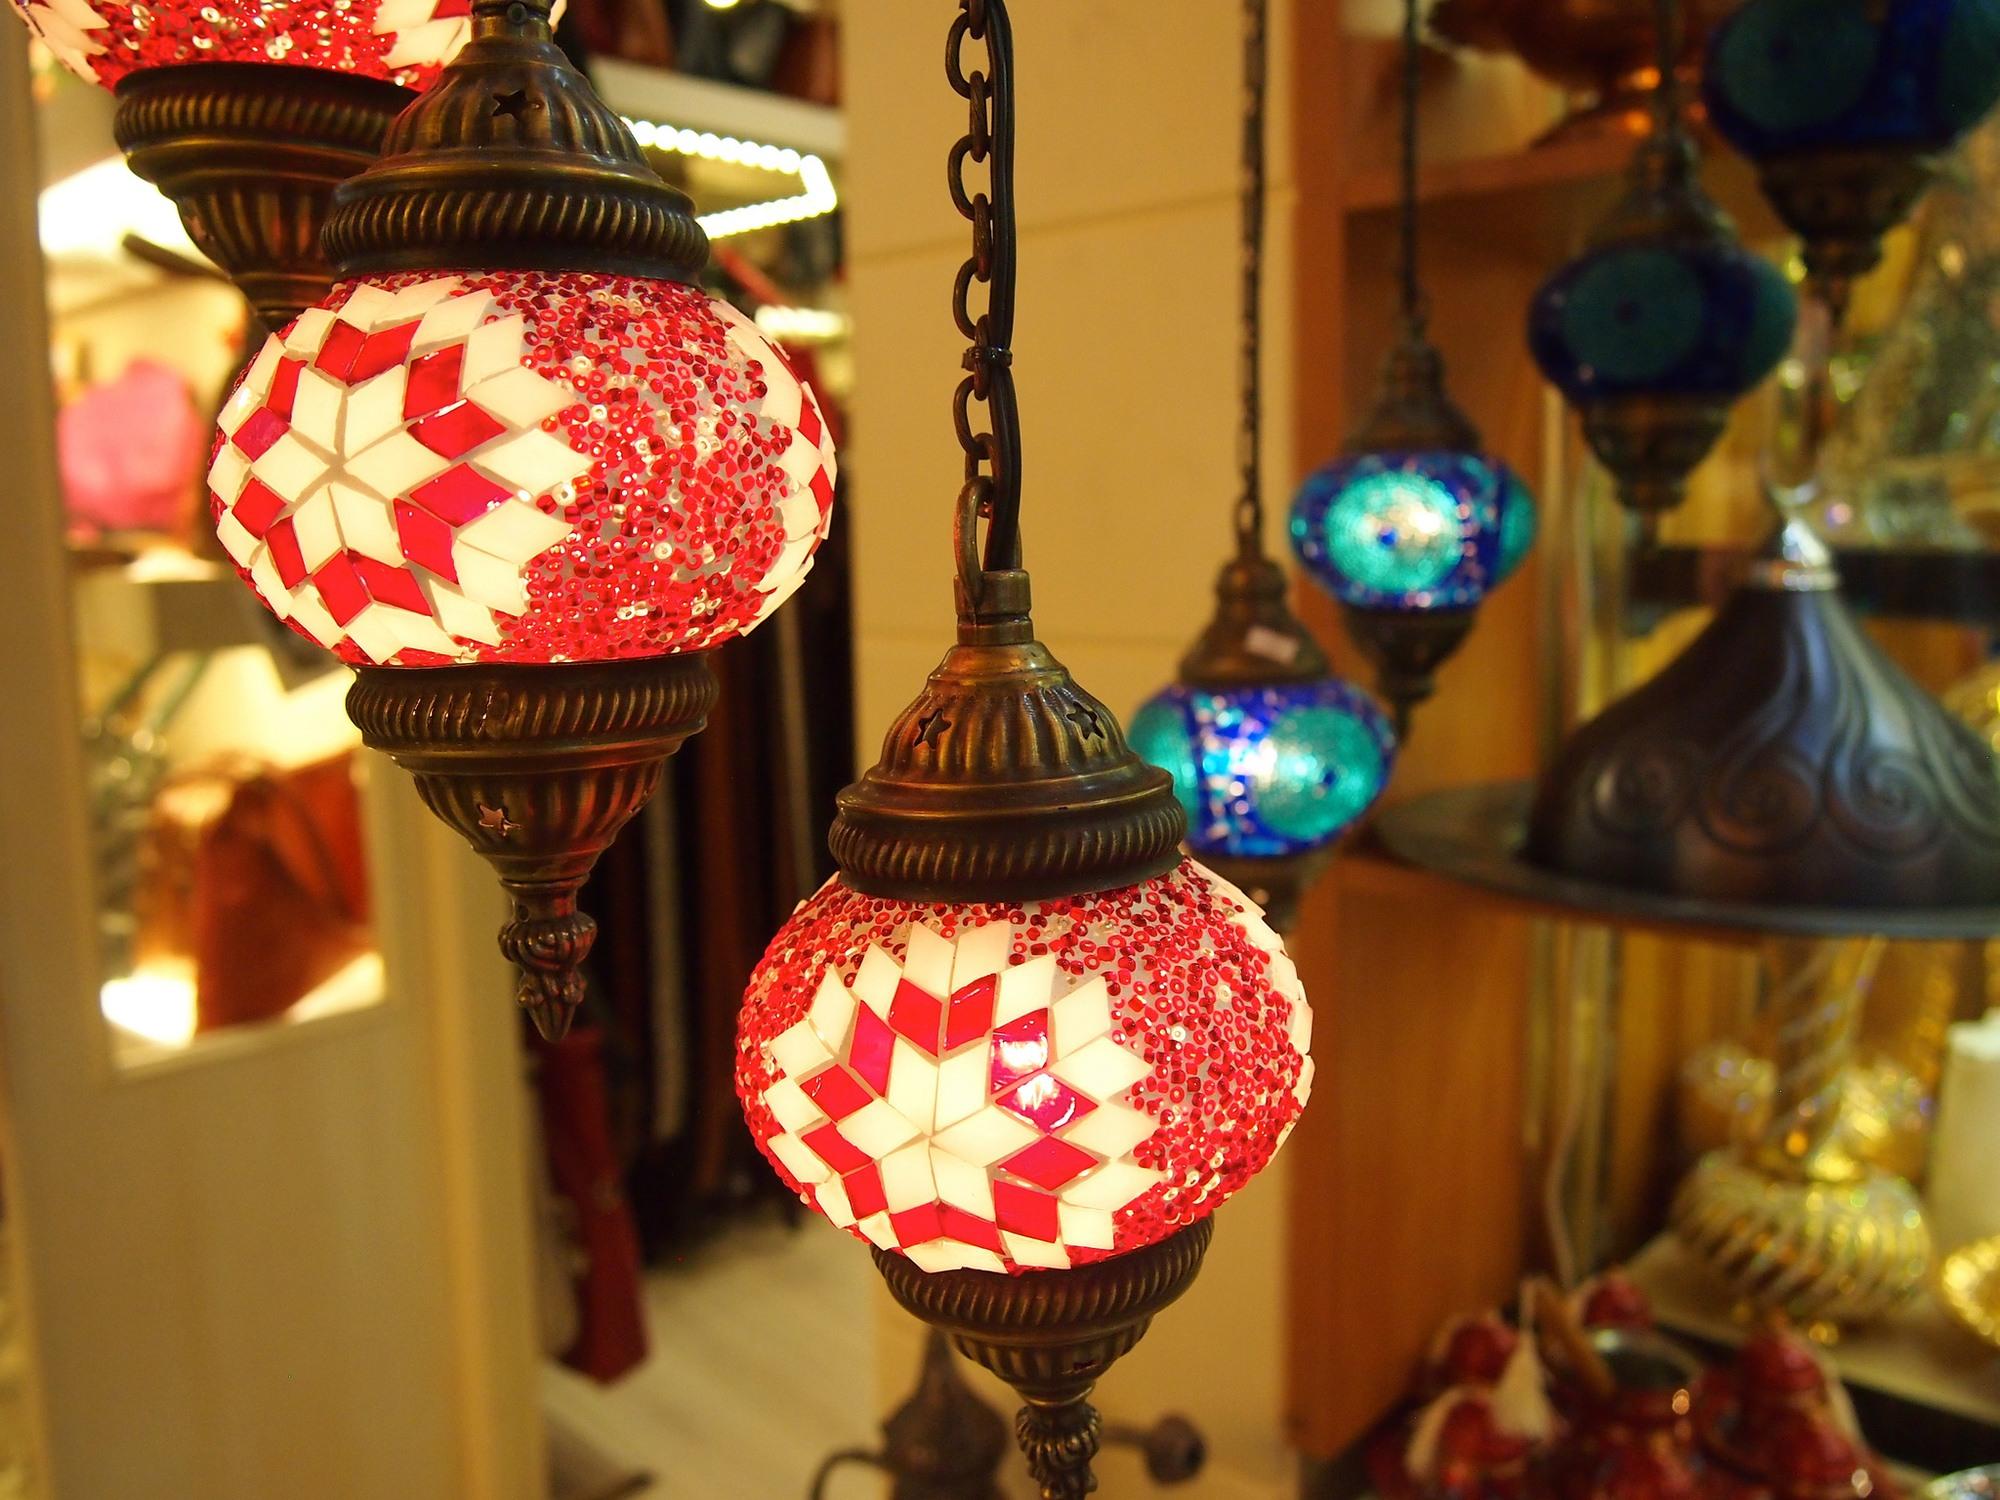 Lanterns in Istanbul's Grand Bazaar